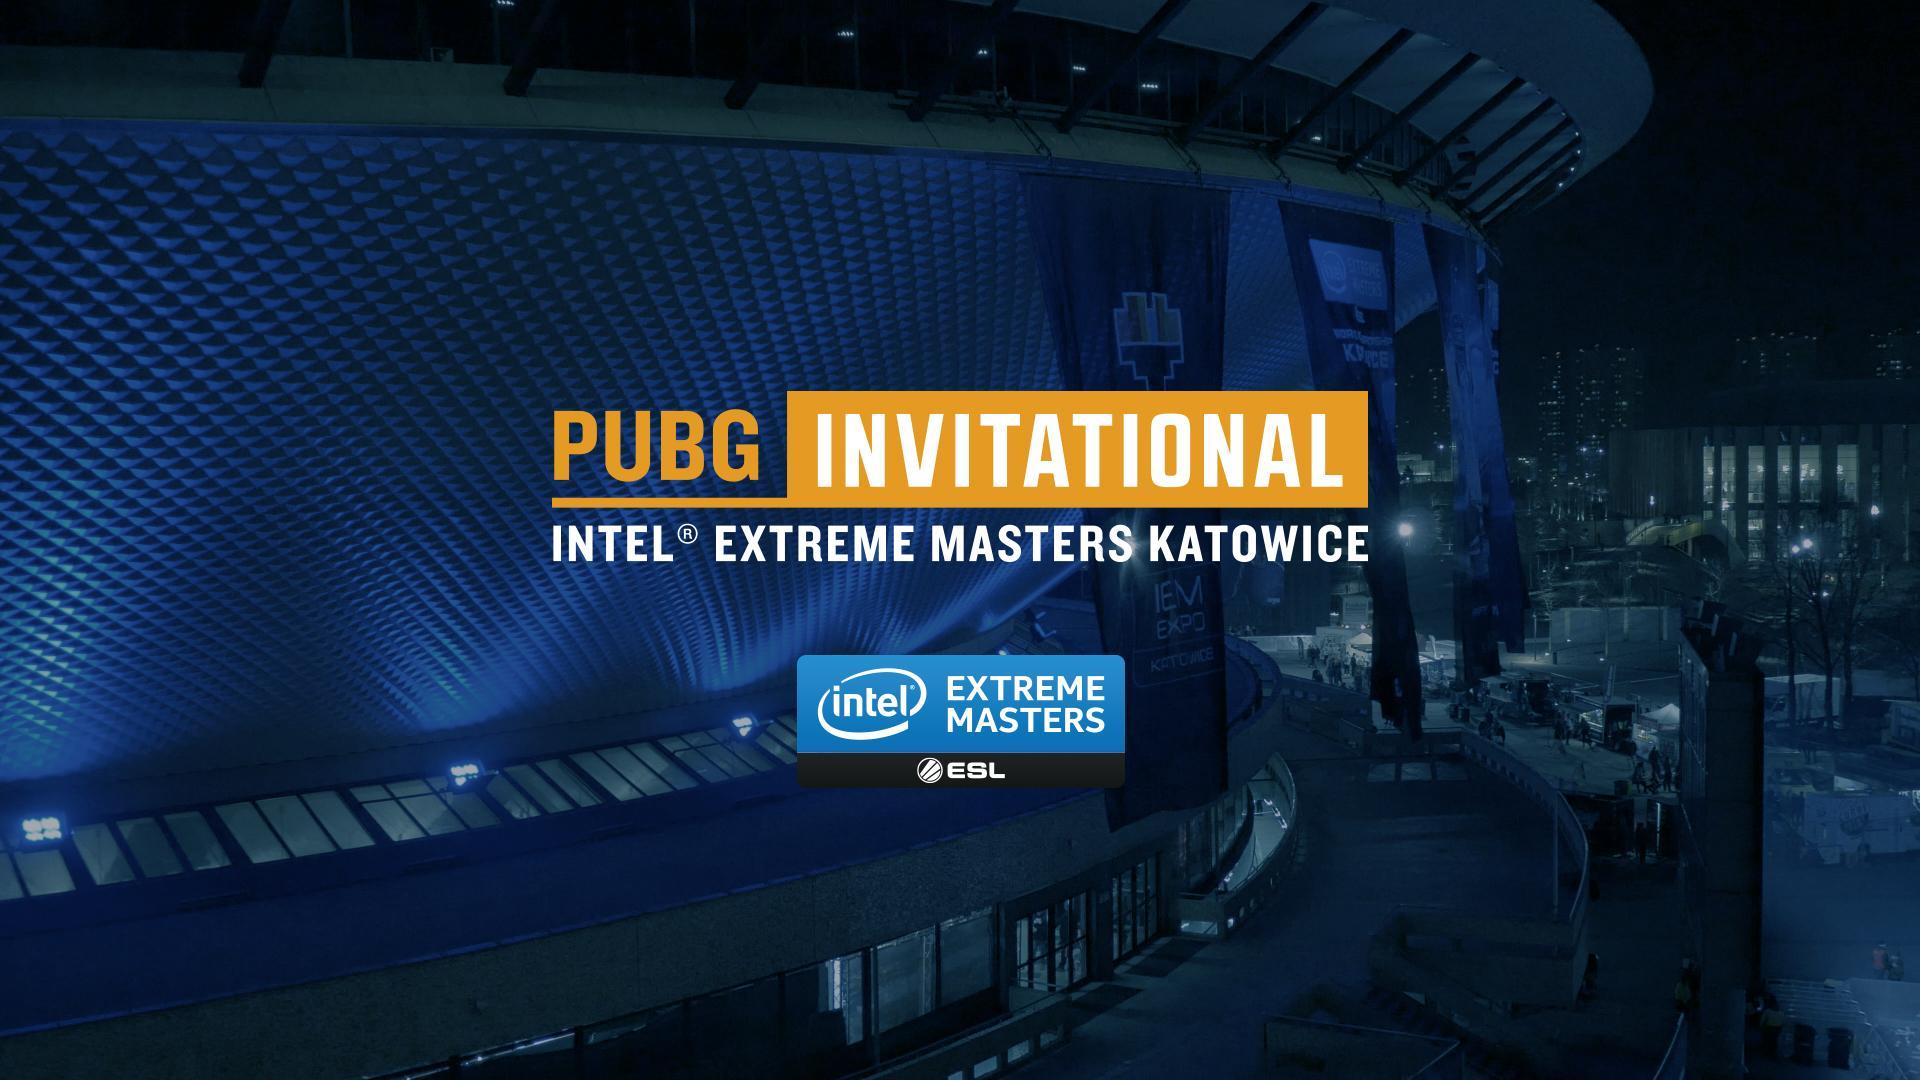 PUBG Invitational na Intel Extreme Masters Katowice 2018